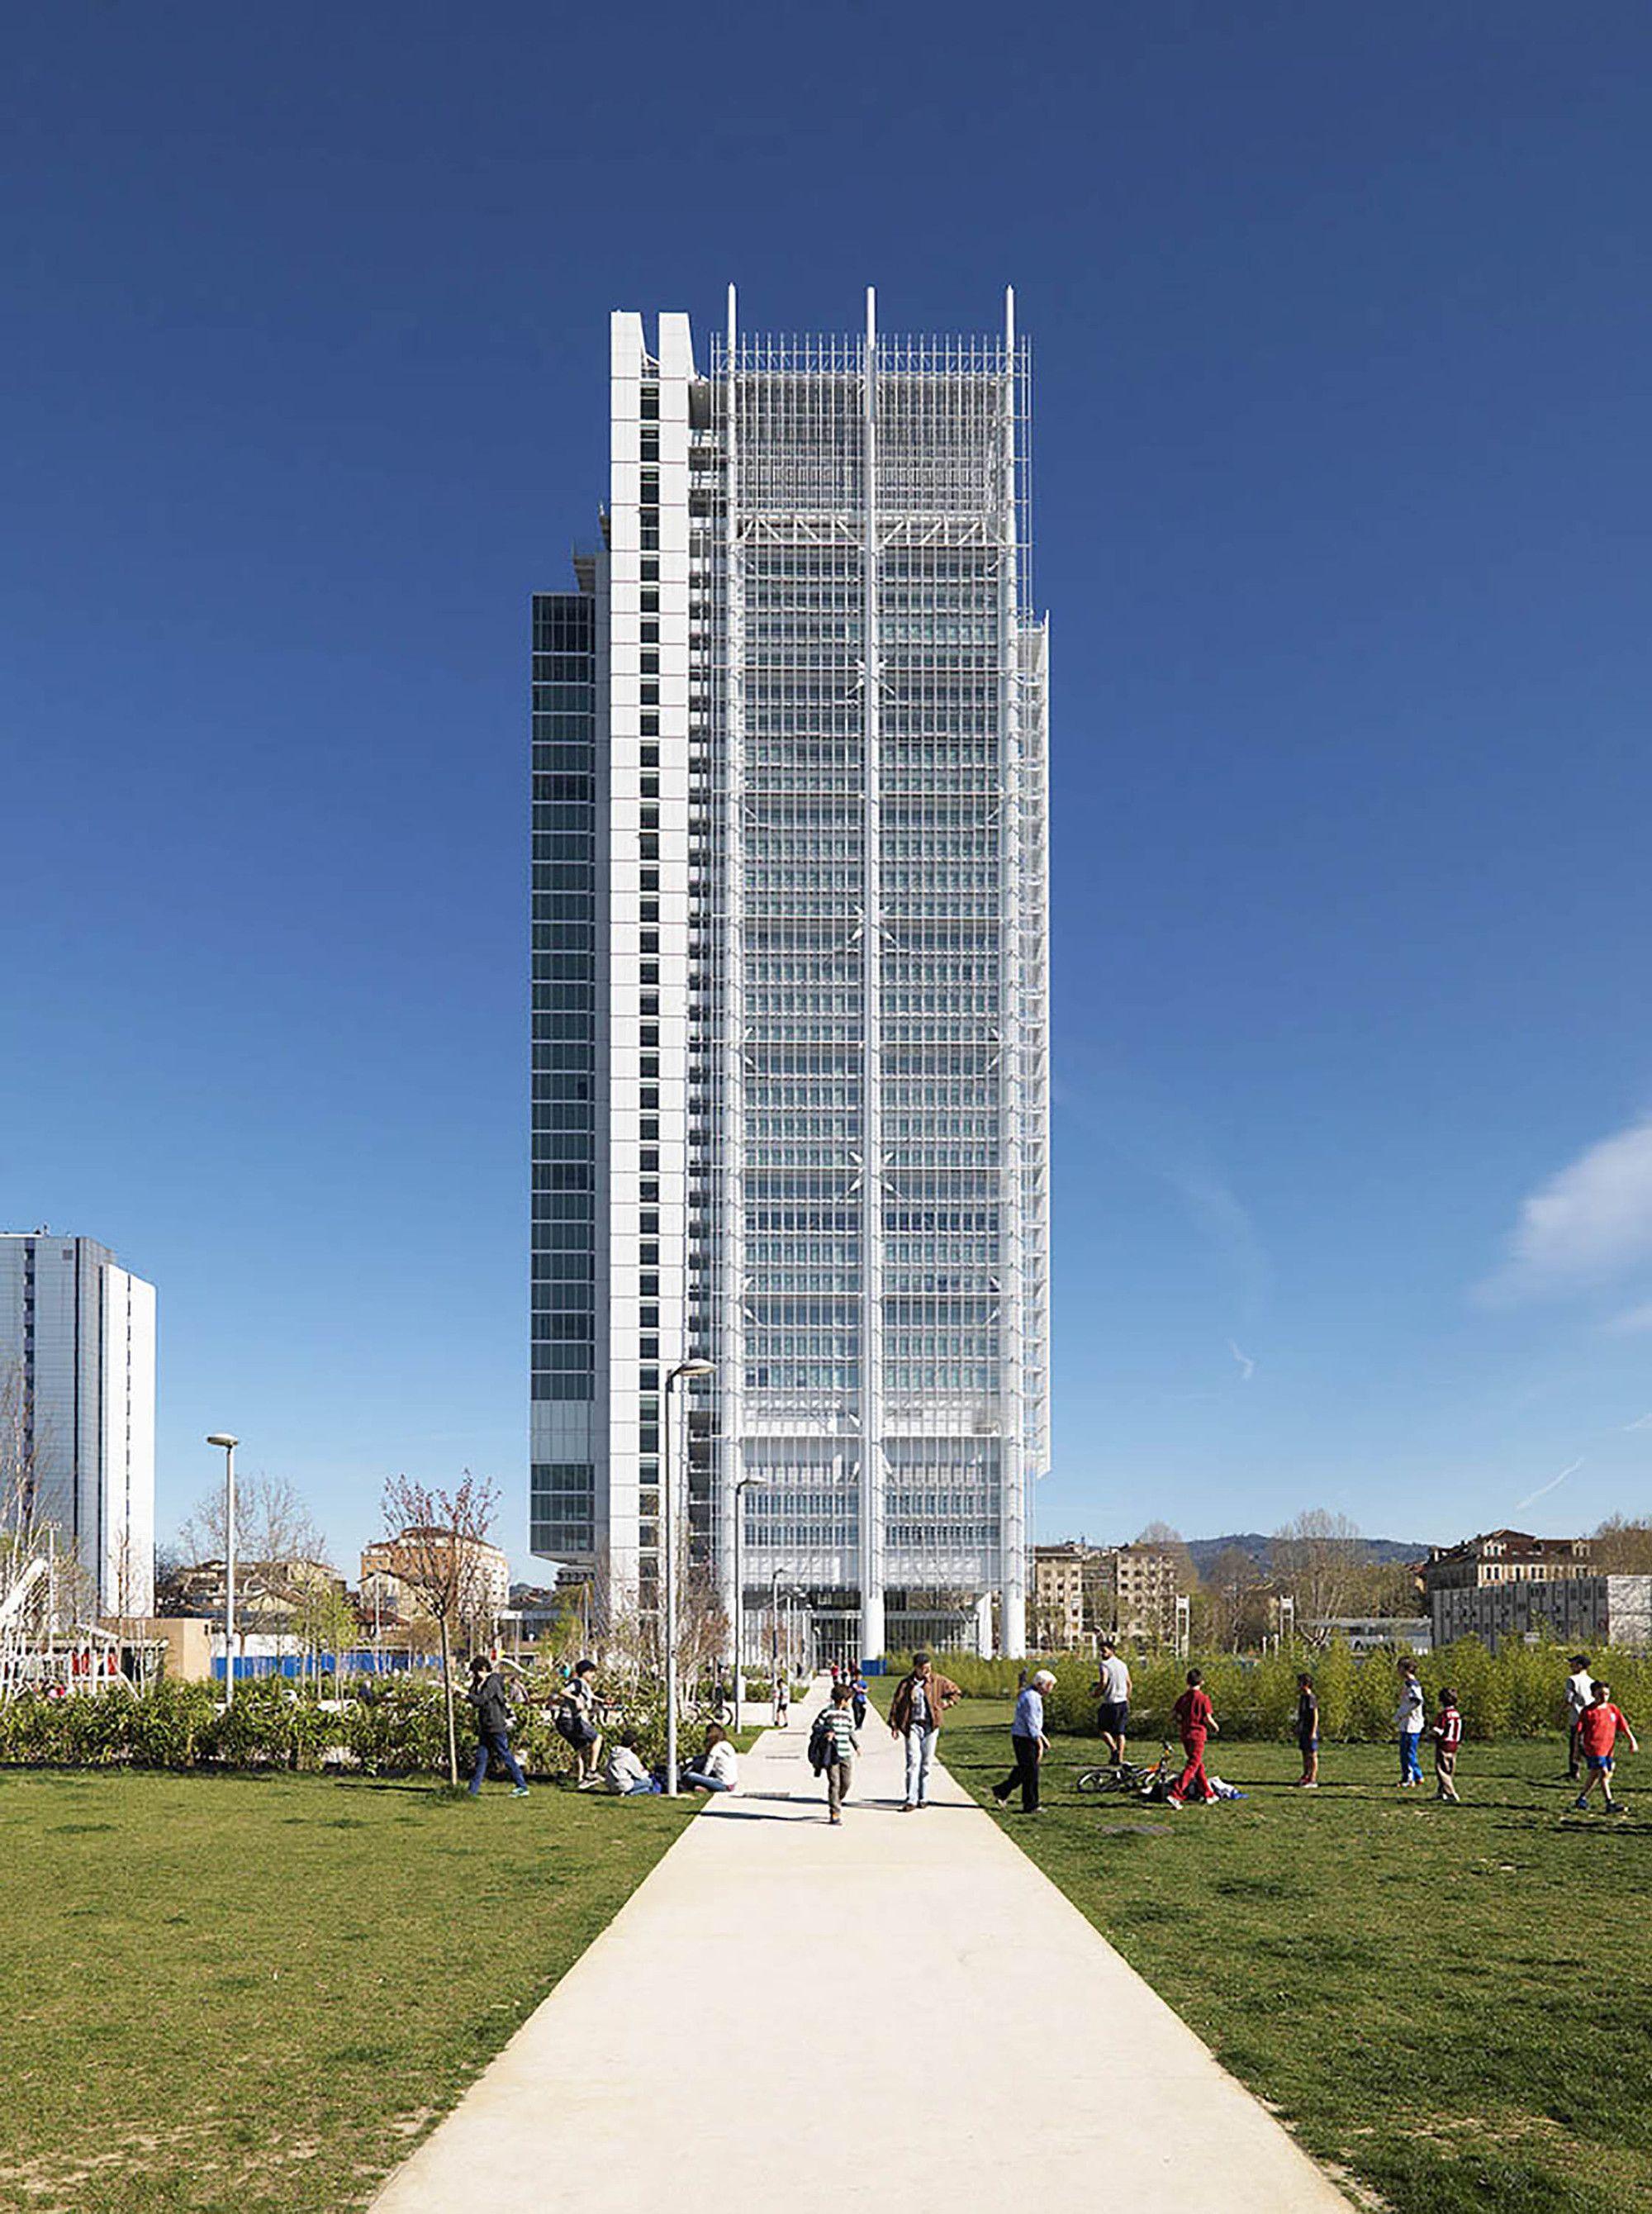 Intesa Sanpaolo fice Building in Turin Italy by Renzo Piano Building Workshop